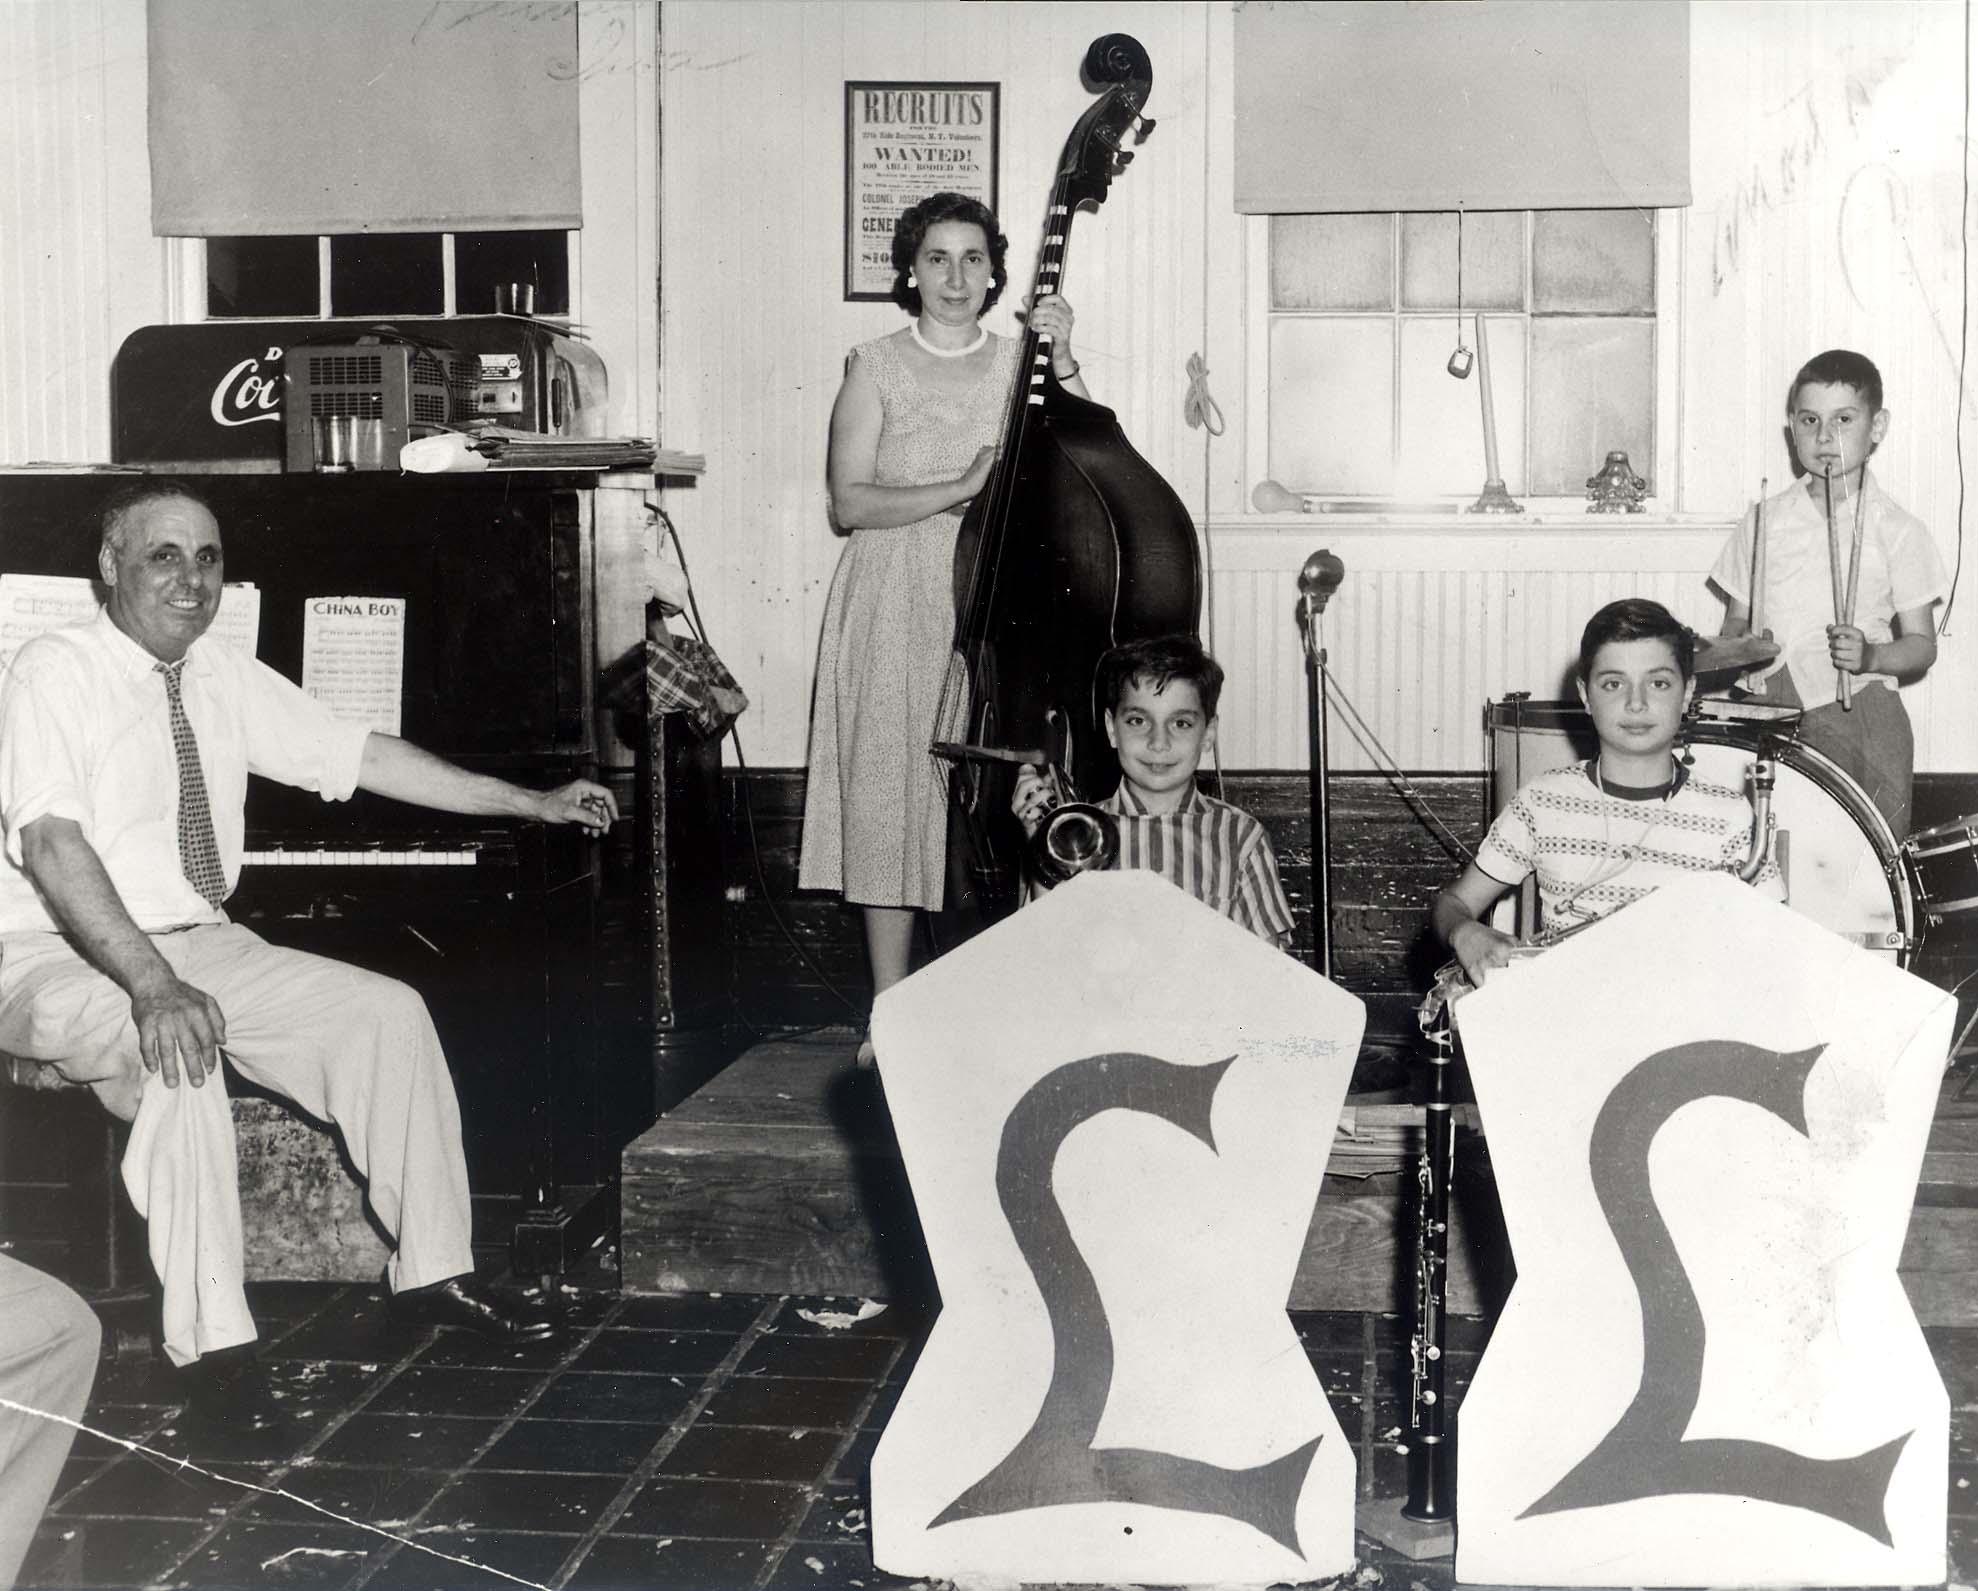 The la barbera family band